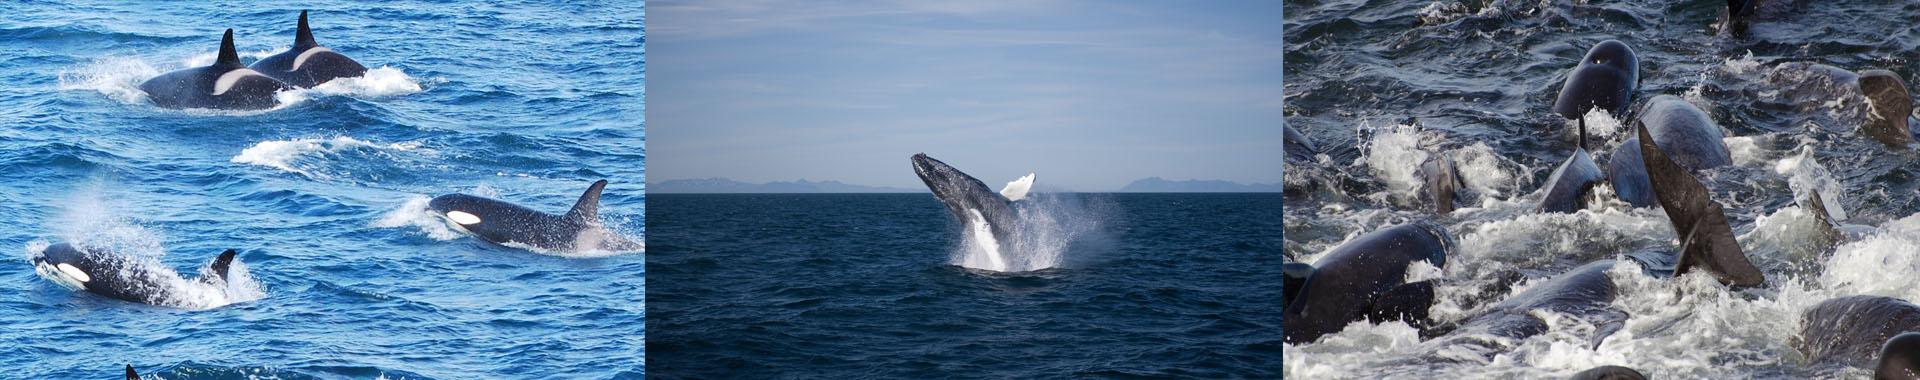 Header-Whale-watching-